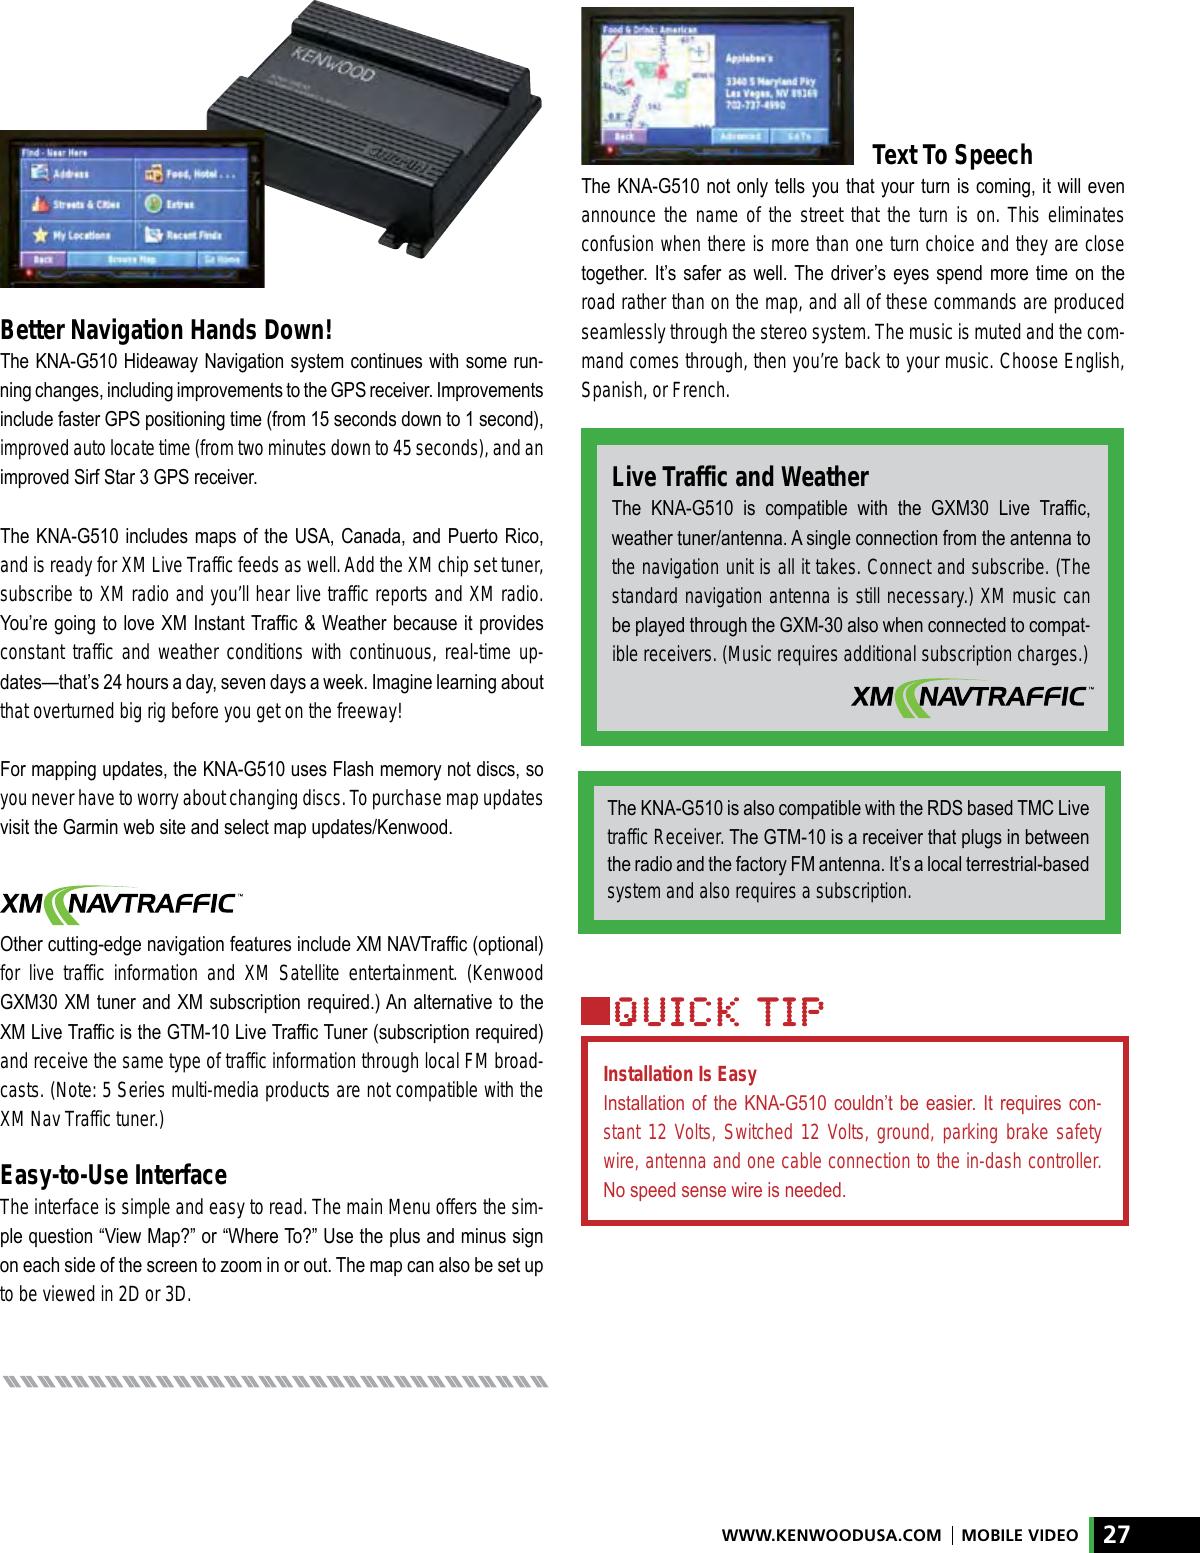 Kenwood Amped Xr S17P Users Manual